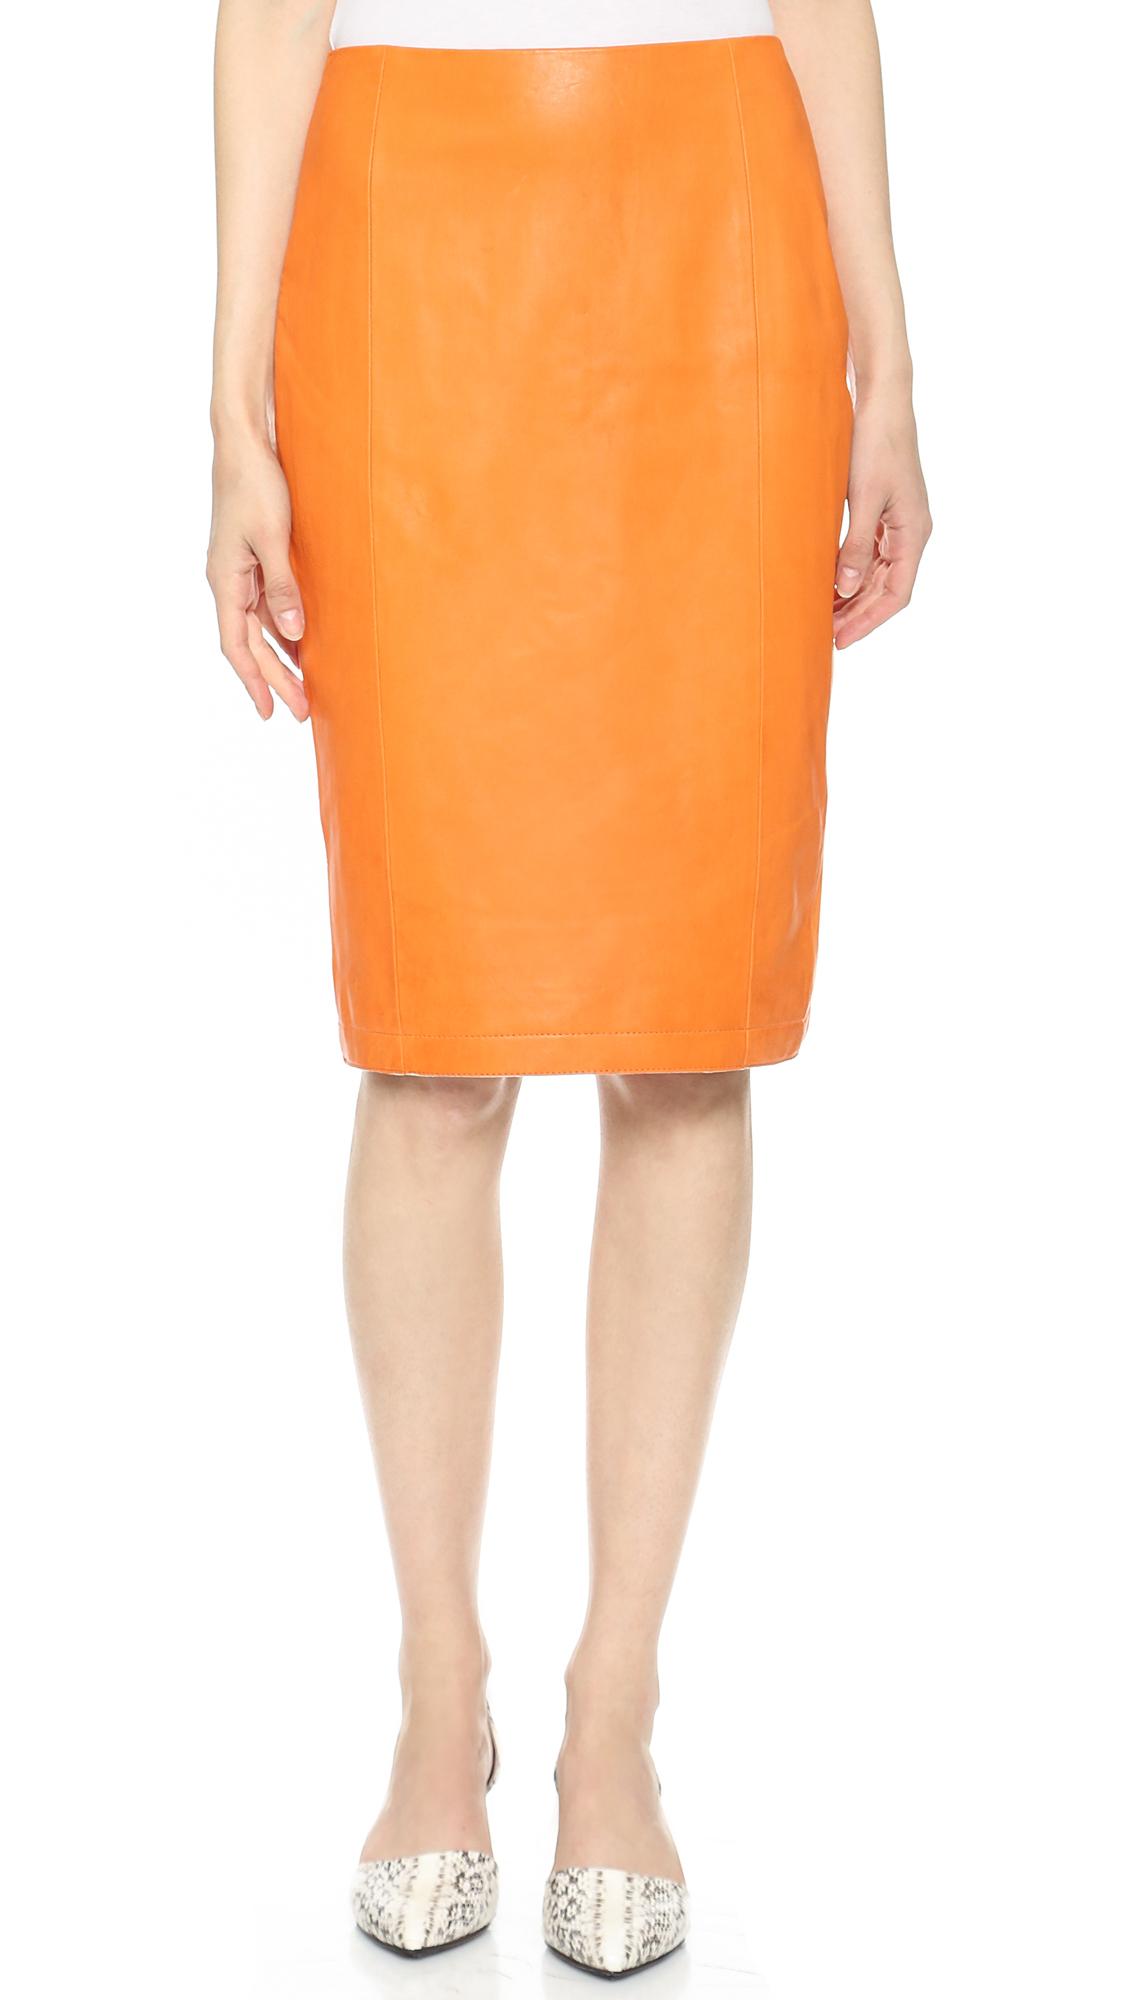 kayne cut away leather skirt orange in orange lyst